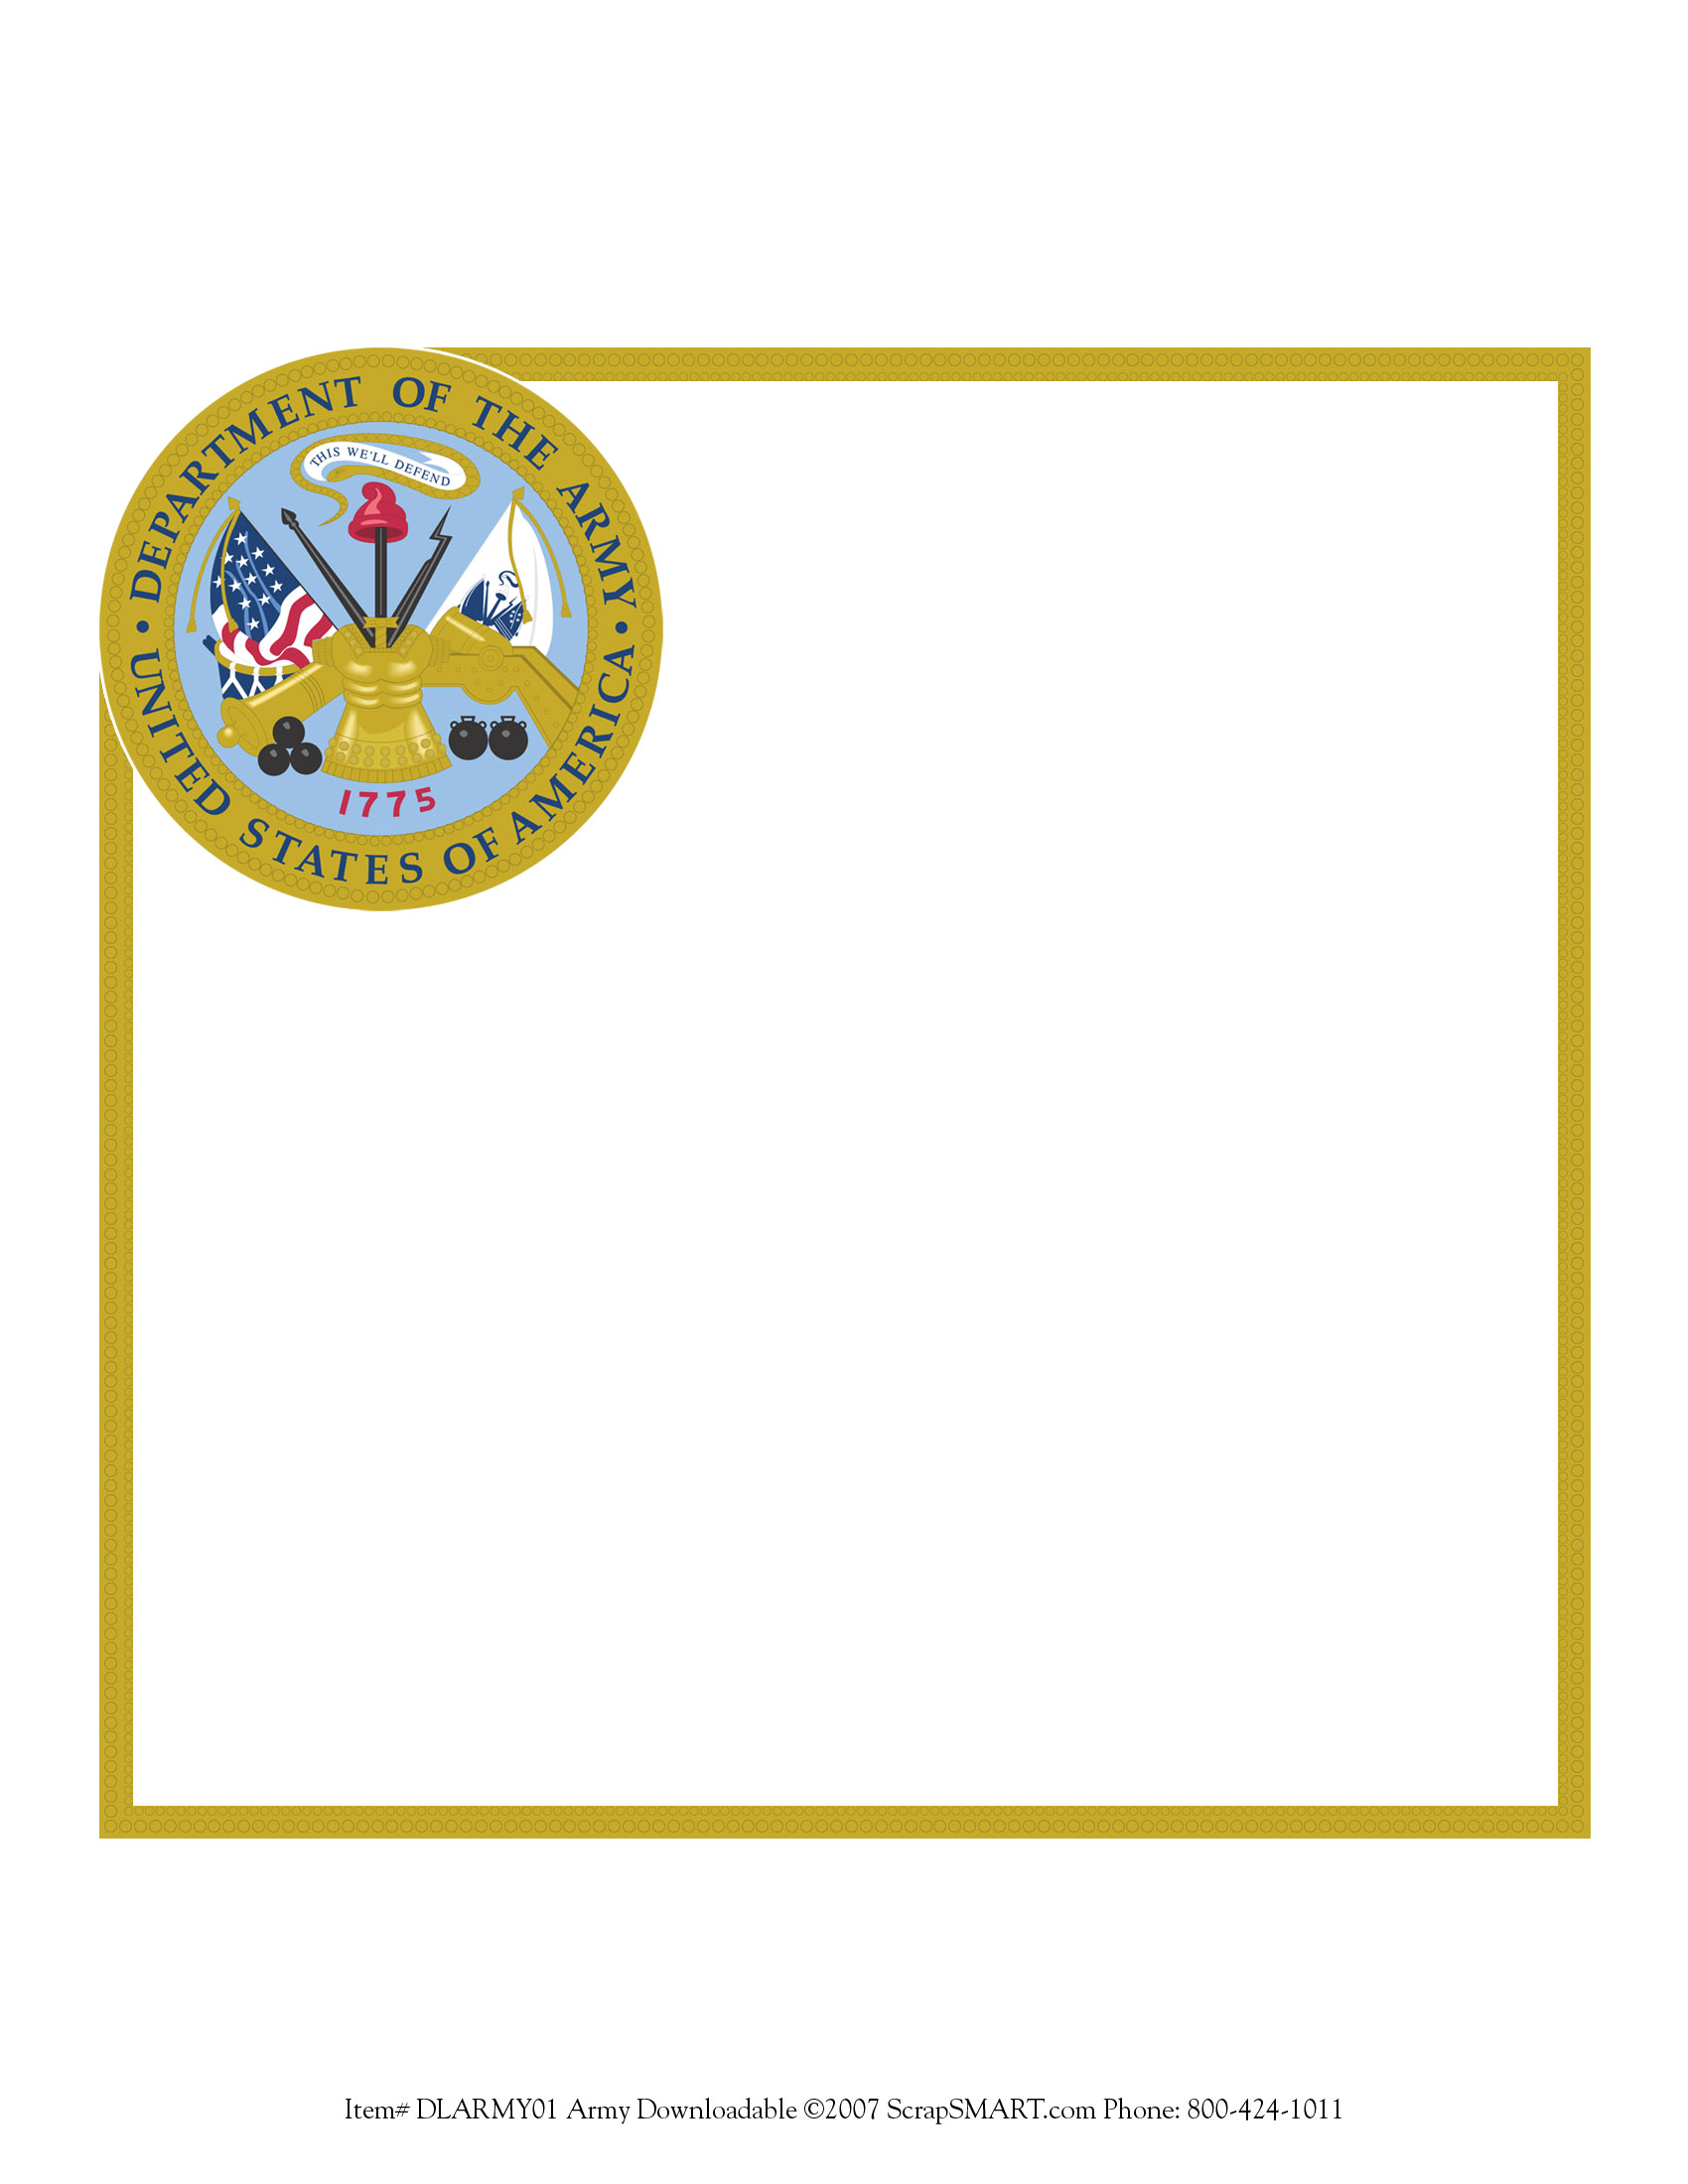 ScrapSMART: FREE Military Frames